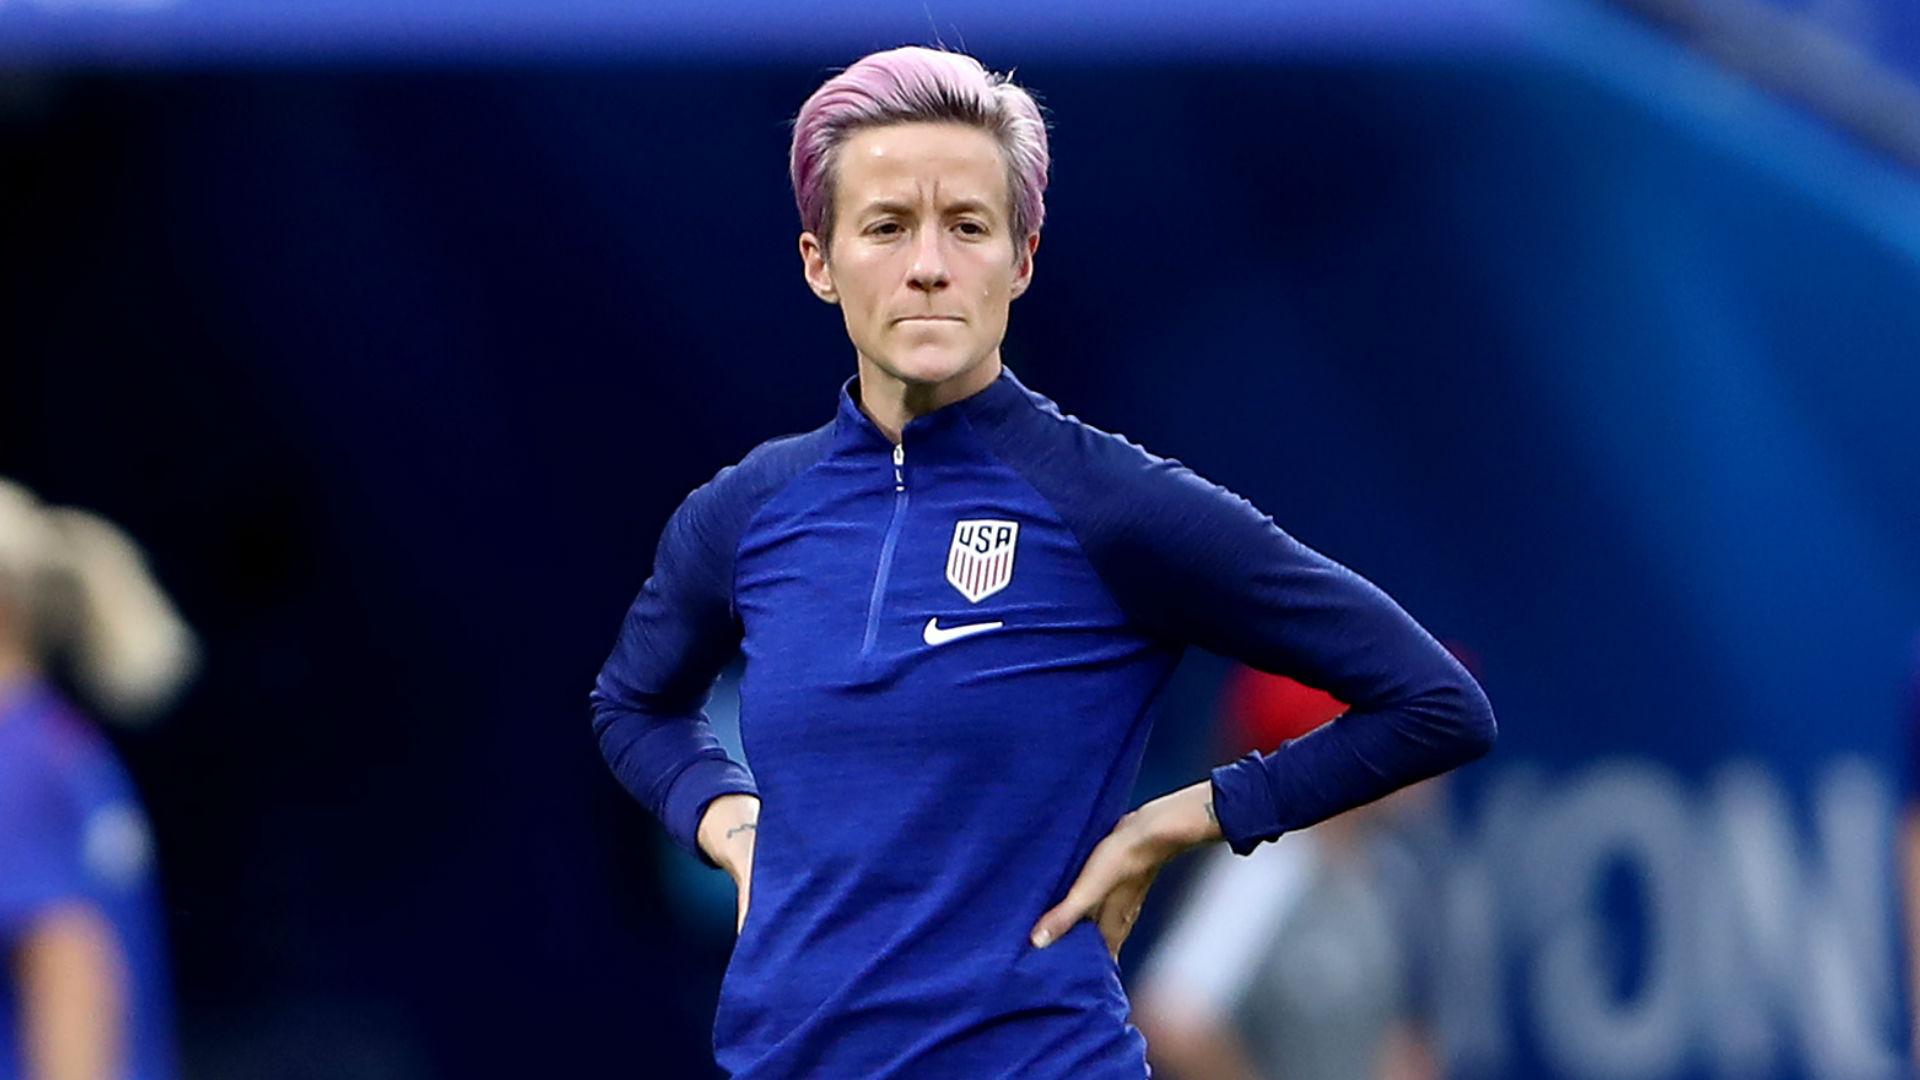 Women's World Cup 2019: Megan Rapinoe could have taken penalty vs. England, Jill Ellis says